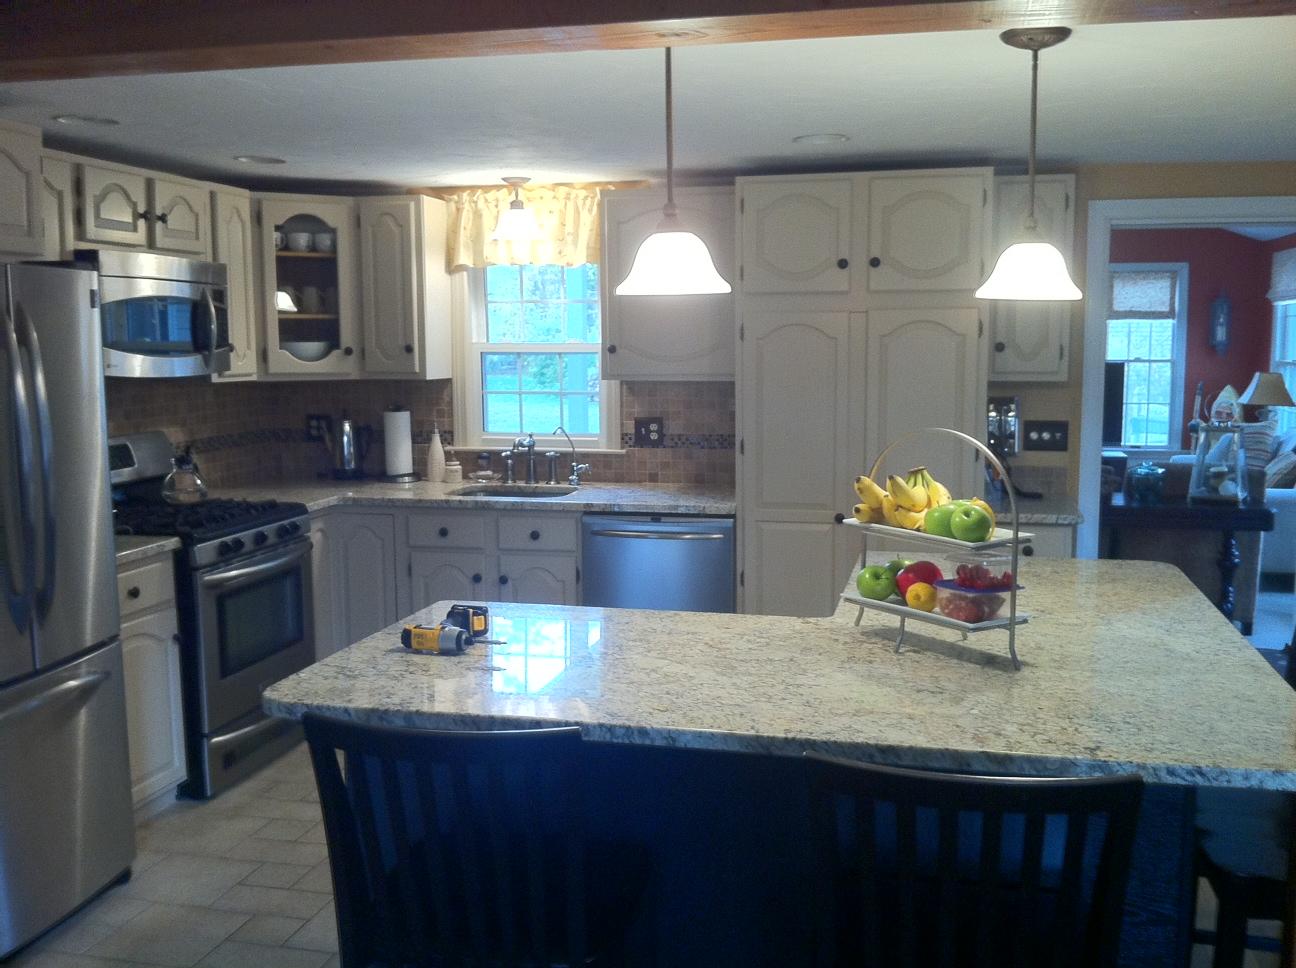 Kitchen Cabinet Refinishing In North Smithfield, Rhode Island